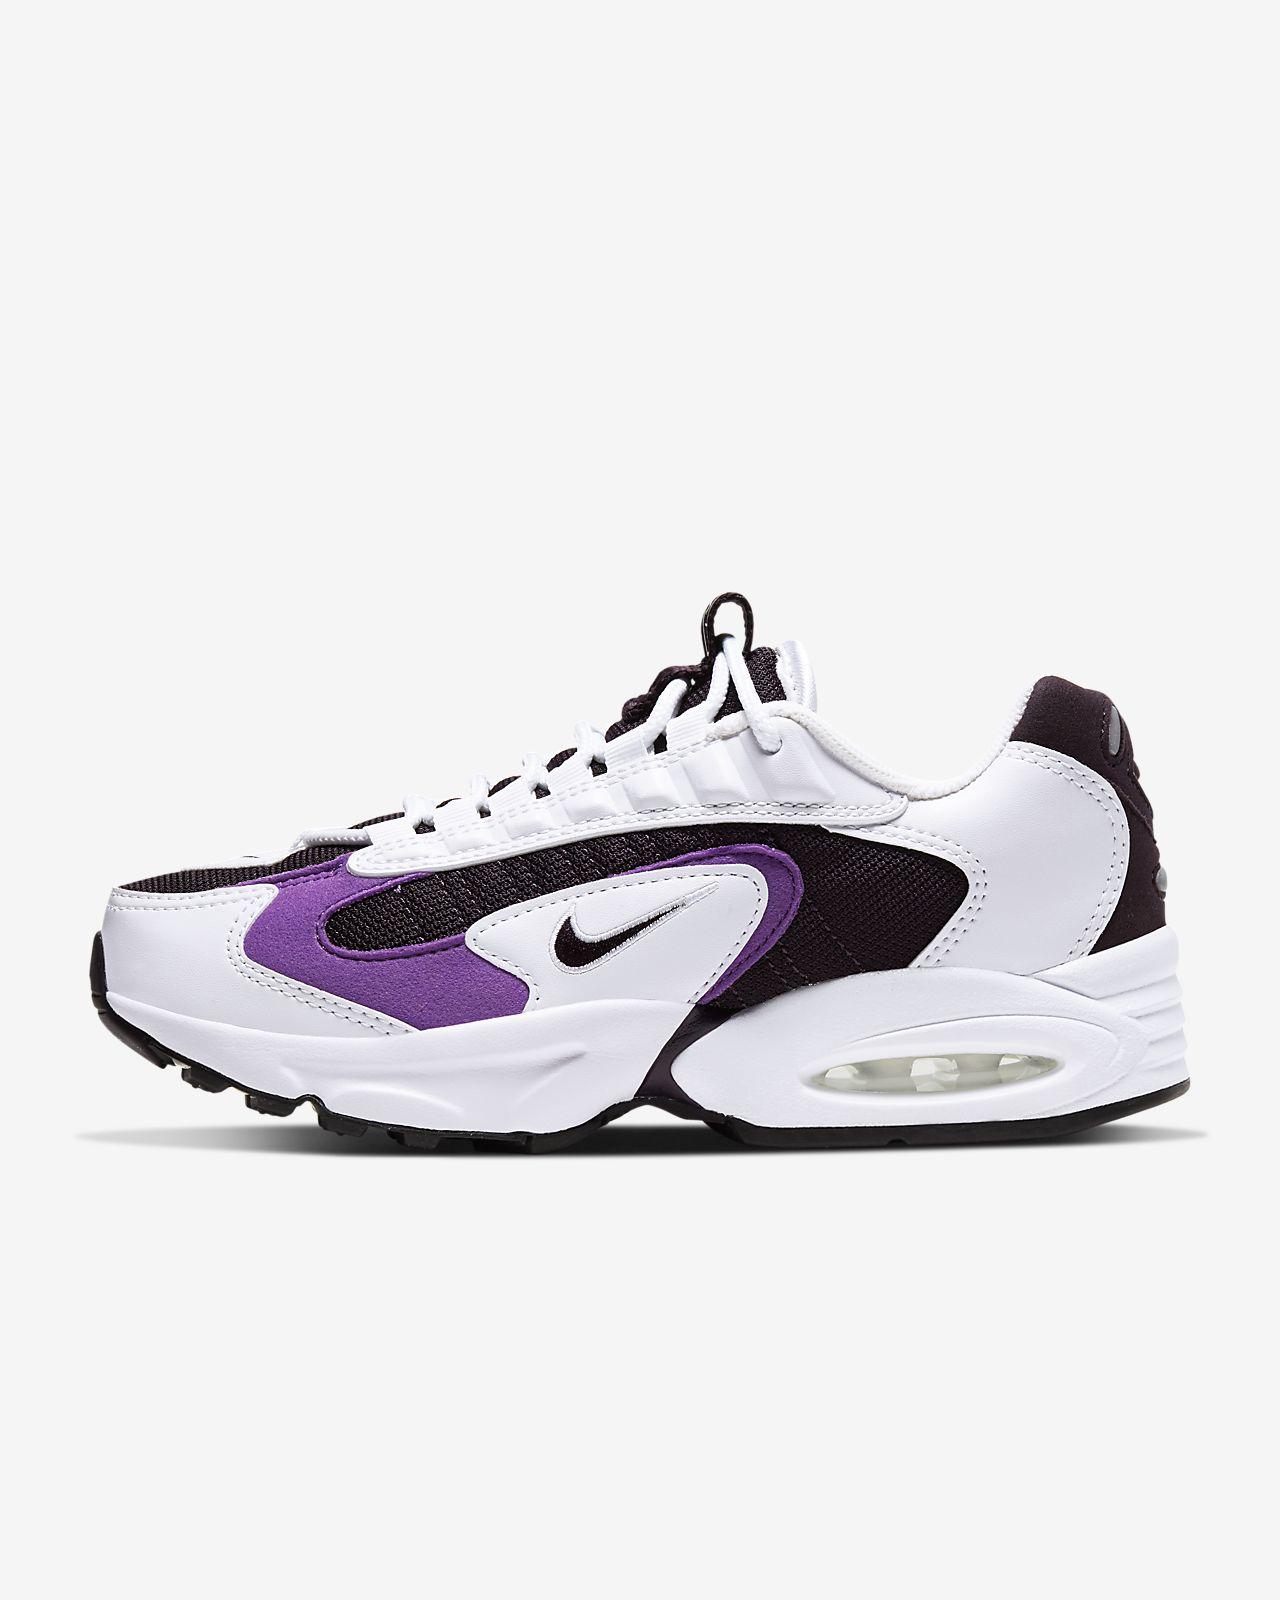 Nike Air Max Triax sko til kvinder